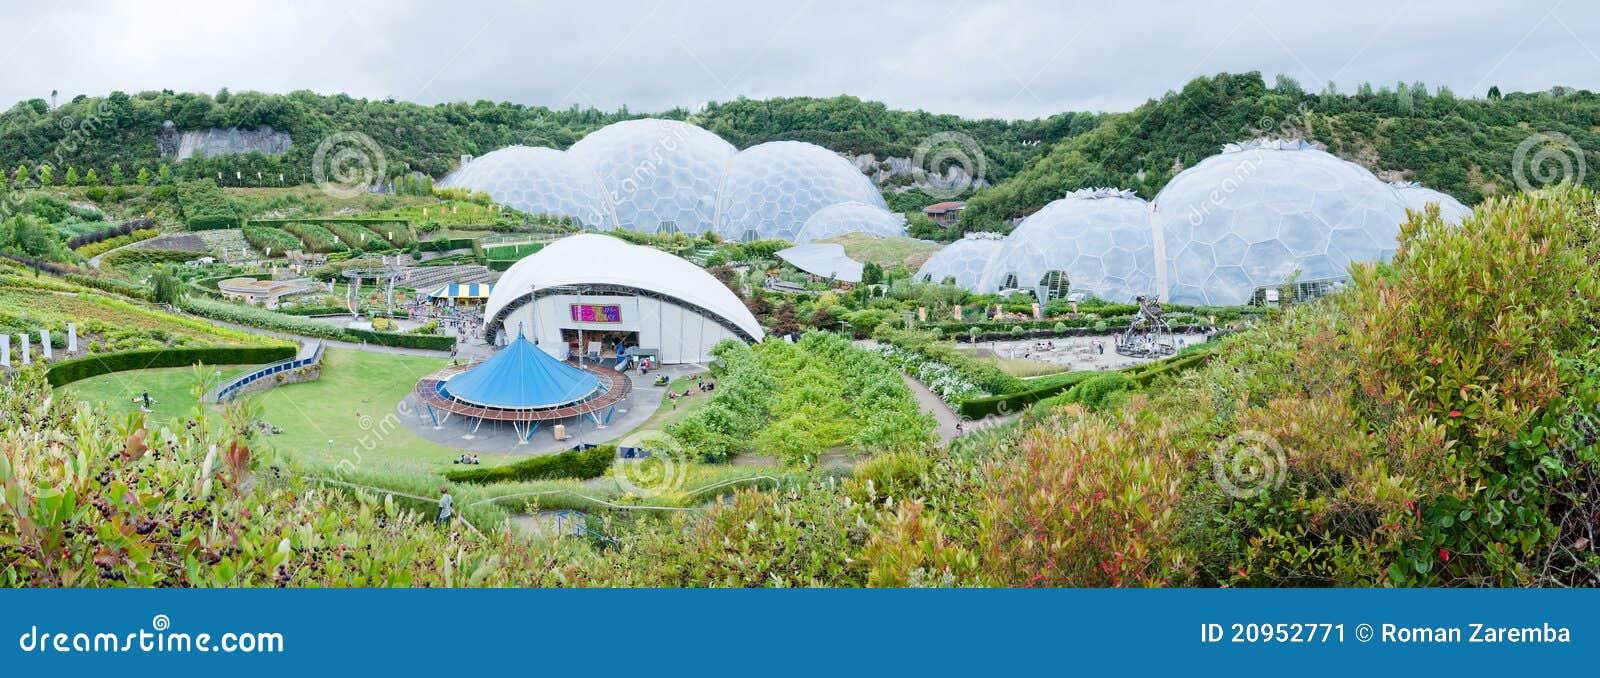 Proyecto de Eden - panorama